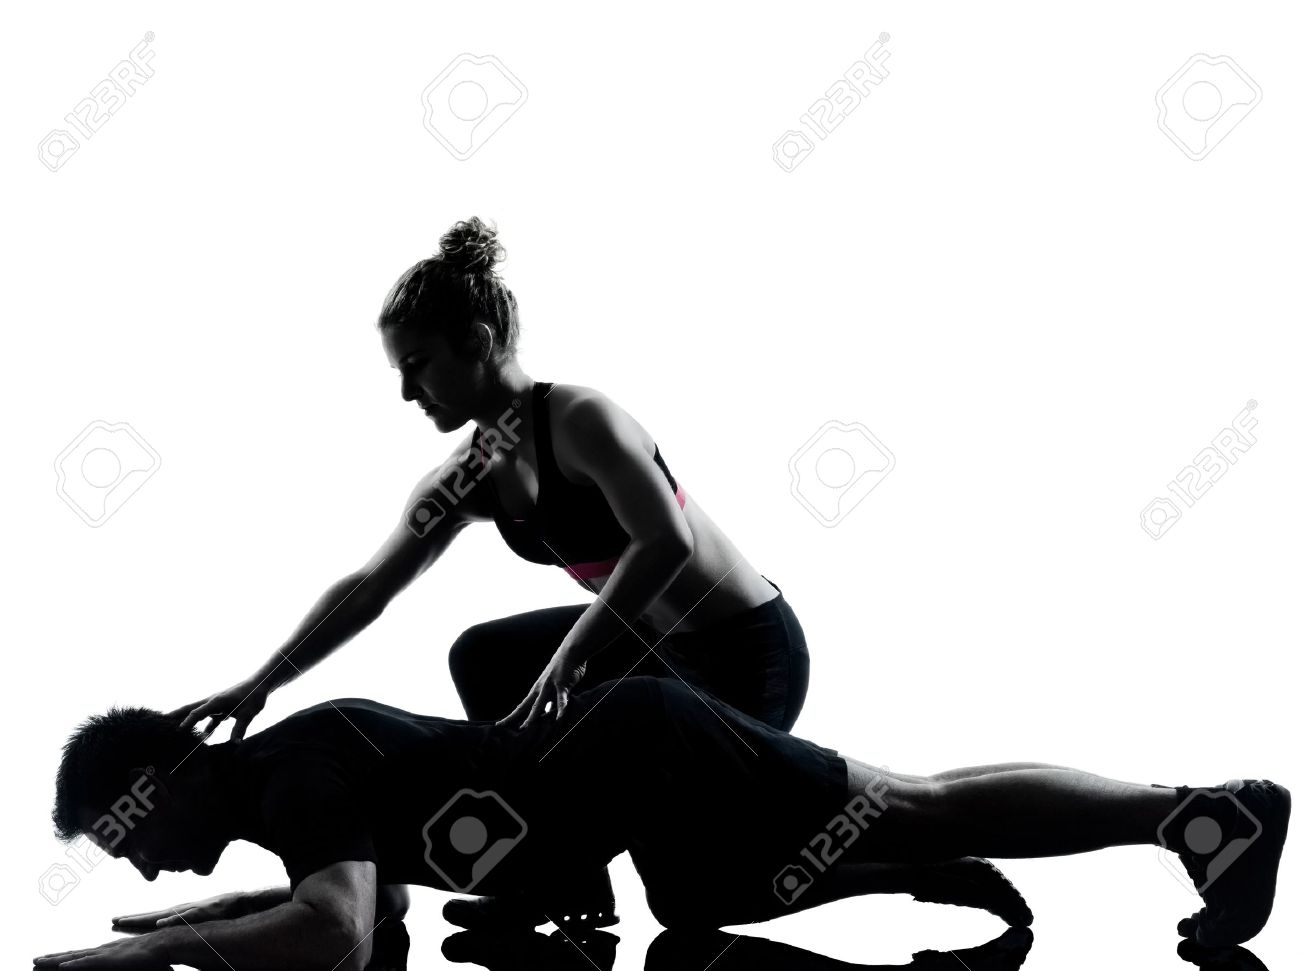 one couple man woman exercising workout aerobic fitness posture full length silouhette on studio isolated on white background Stock Photo - 11752607